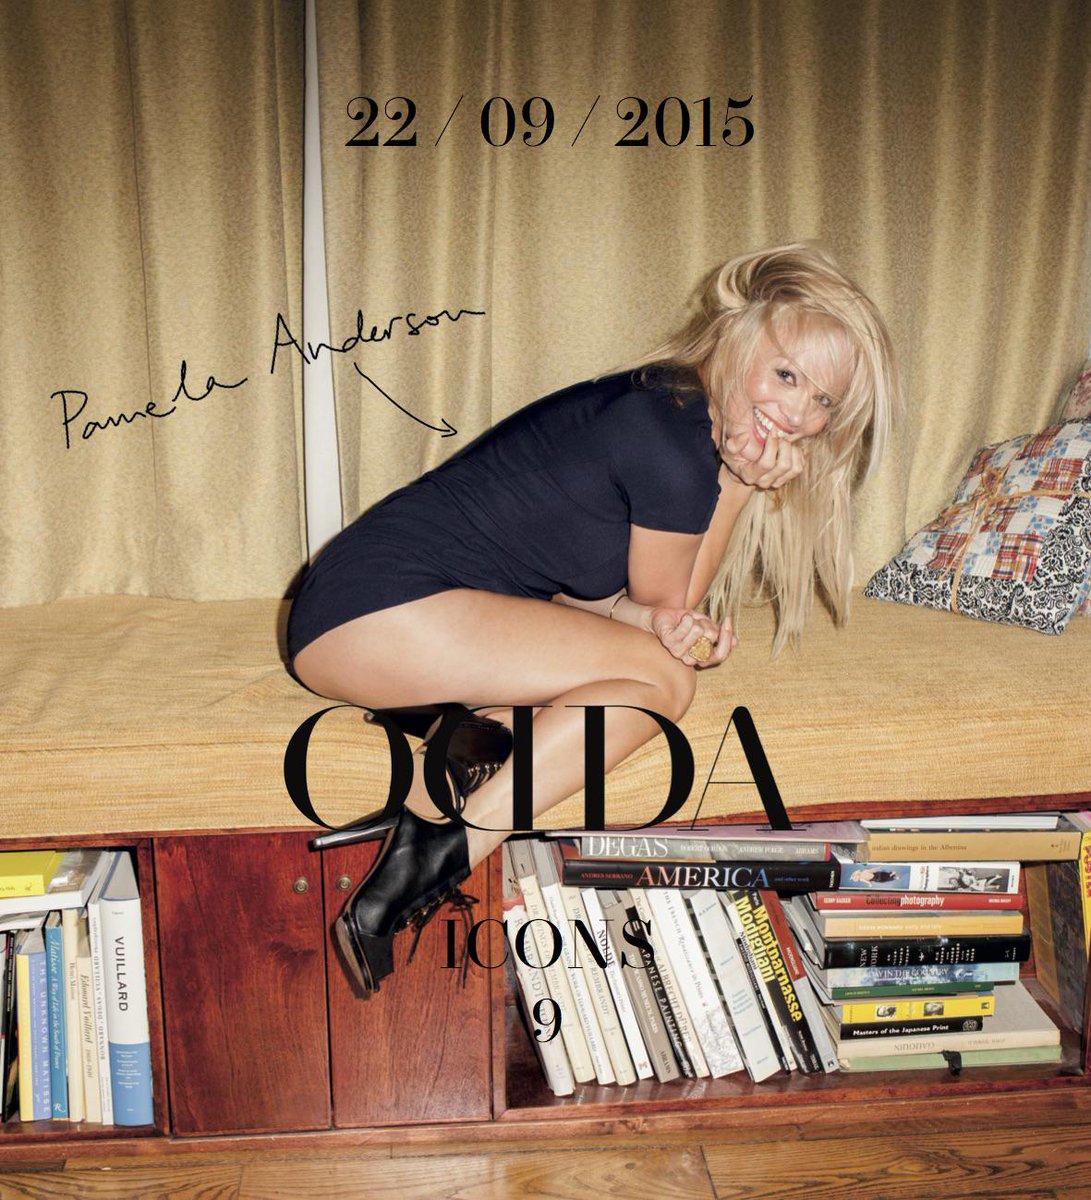 Just landed in Korea.... @ODDAmagazine coming soon #pamelaanderson I love #bradelterman #RocknRoll http://t.co/m1txv4qb2F